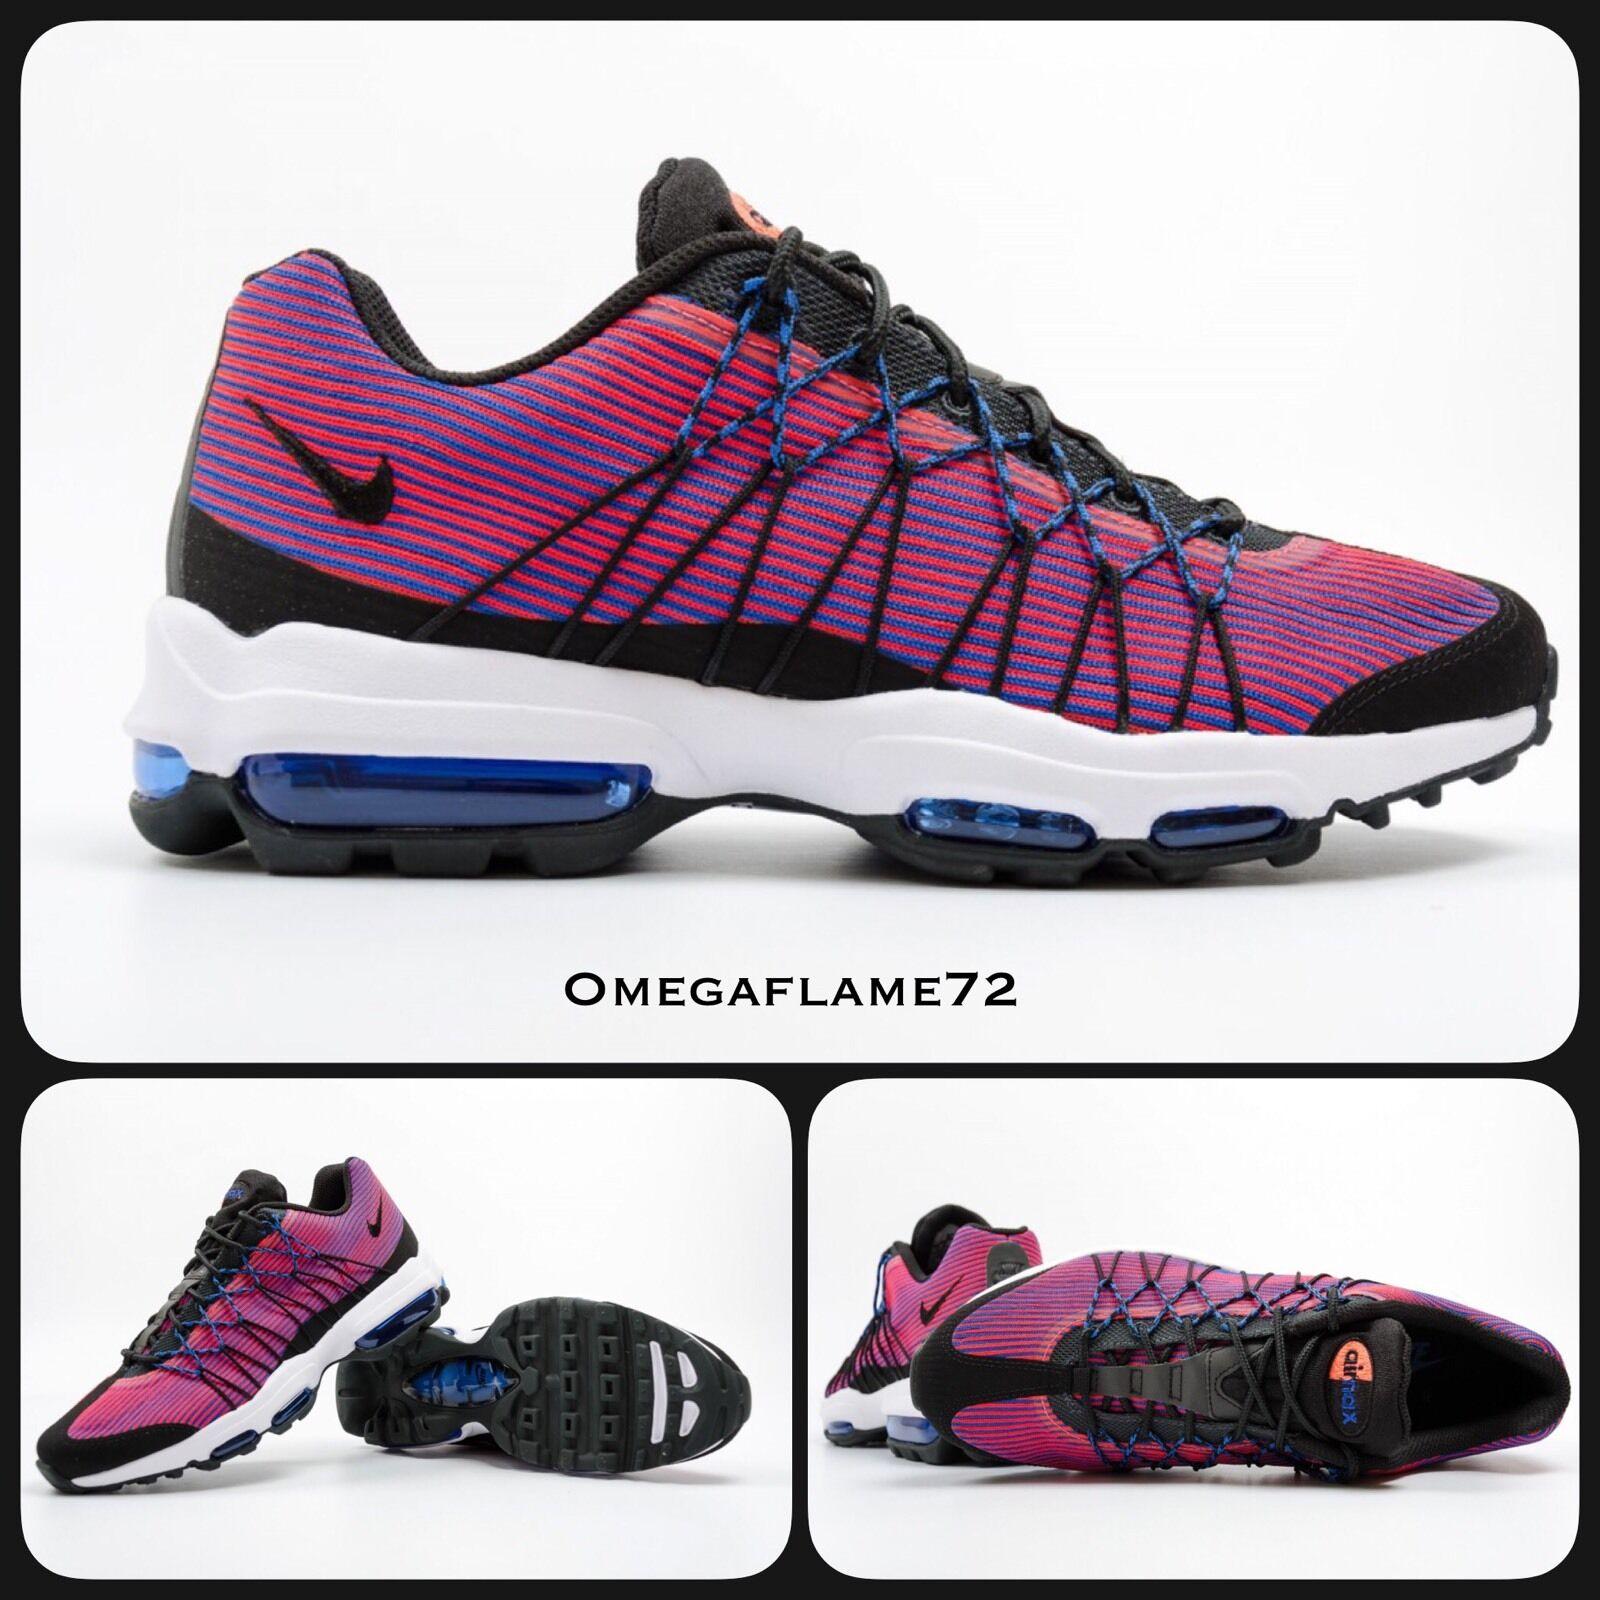 Nike Air Max 95 44 Ultra JCRD 749771-406 U.K. 9 EU 44 95  A 10 Atmos Patta Woven 85387e